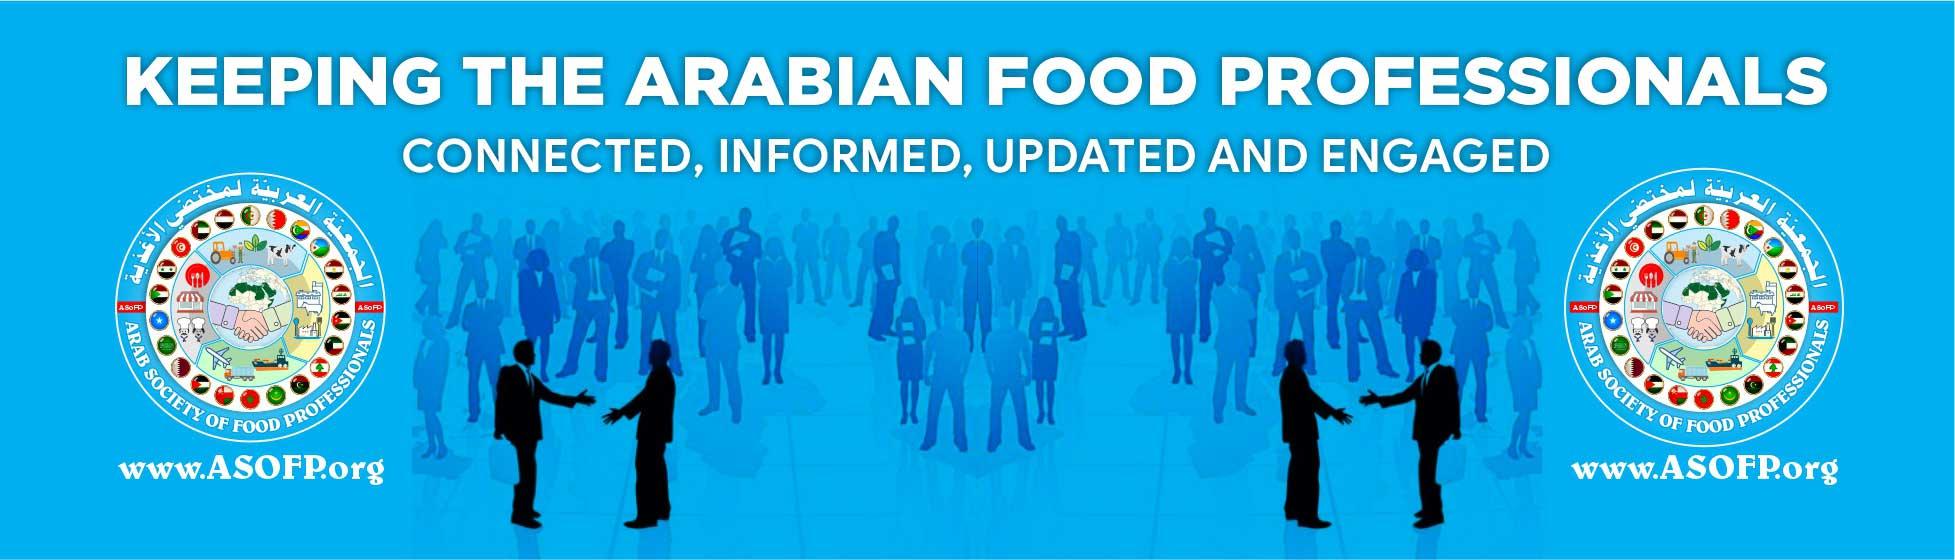 ASOFP Food Professionals Banner 1 2